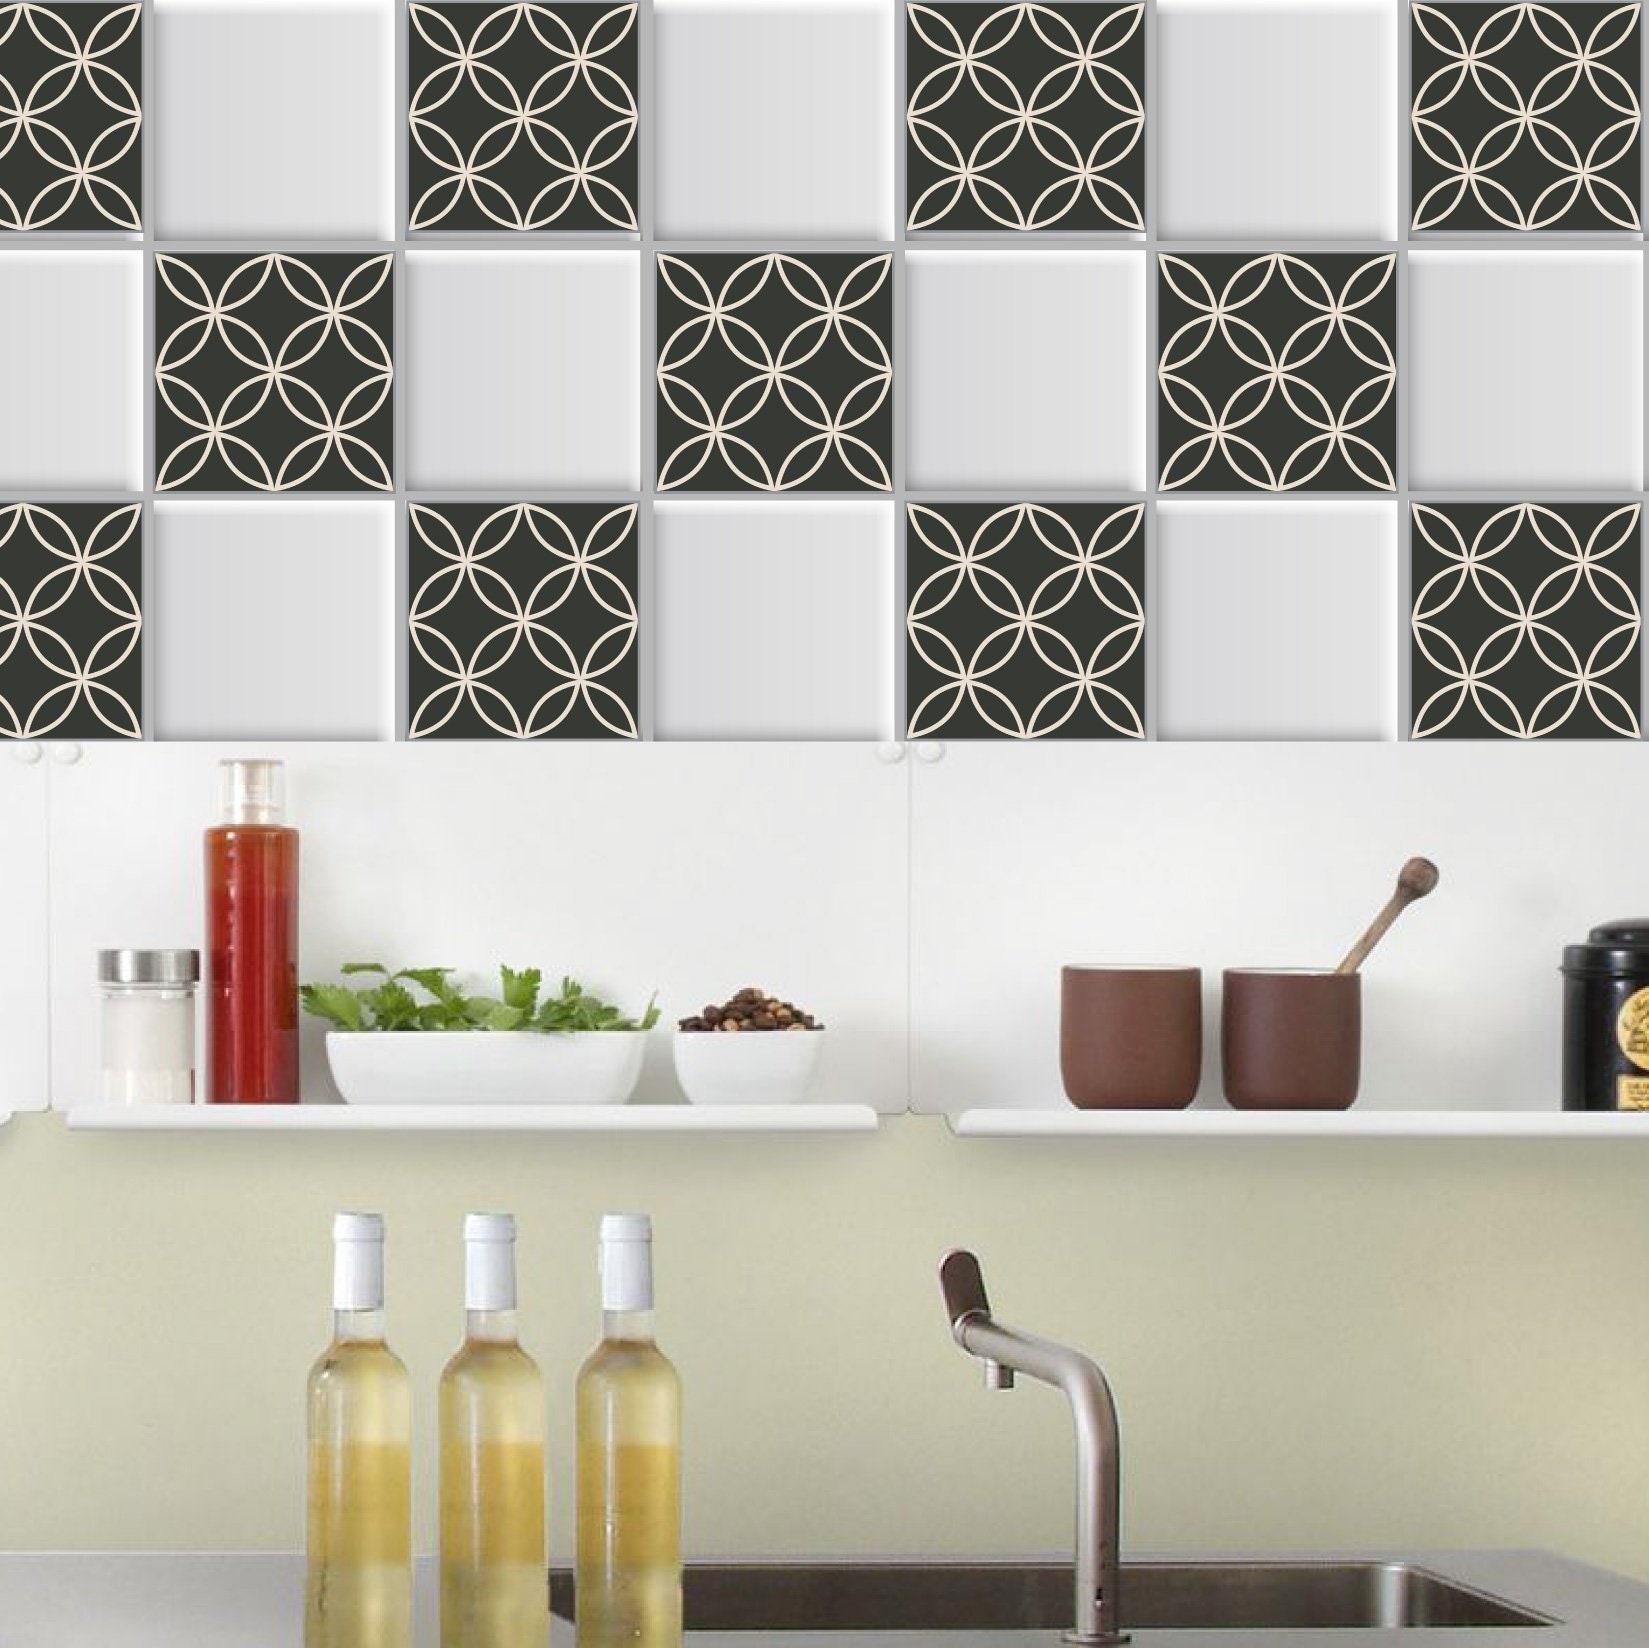 Geometric Tile Stickers Set Of 24 Tile Sticker Kitchen Bathroom Floor Wall Waterproof Removable Peel N Stick Fireplace Tile Stickers